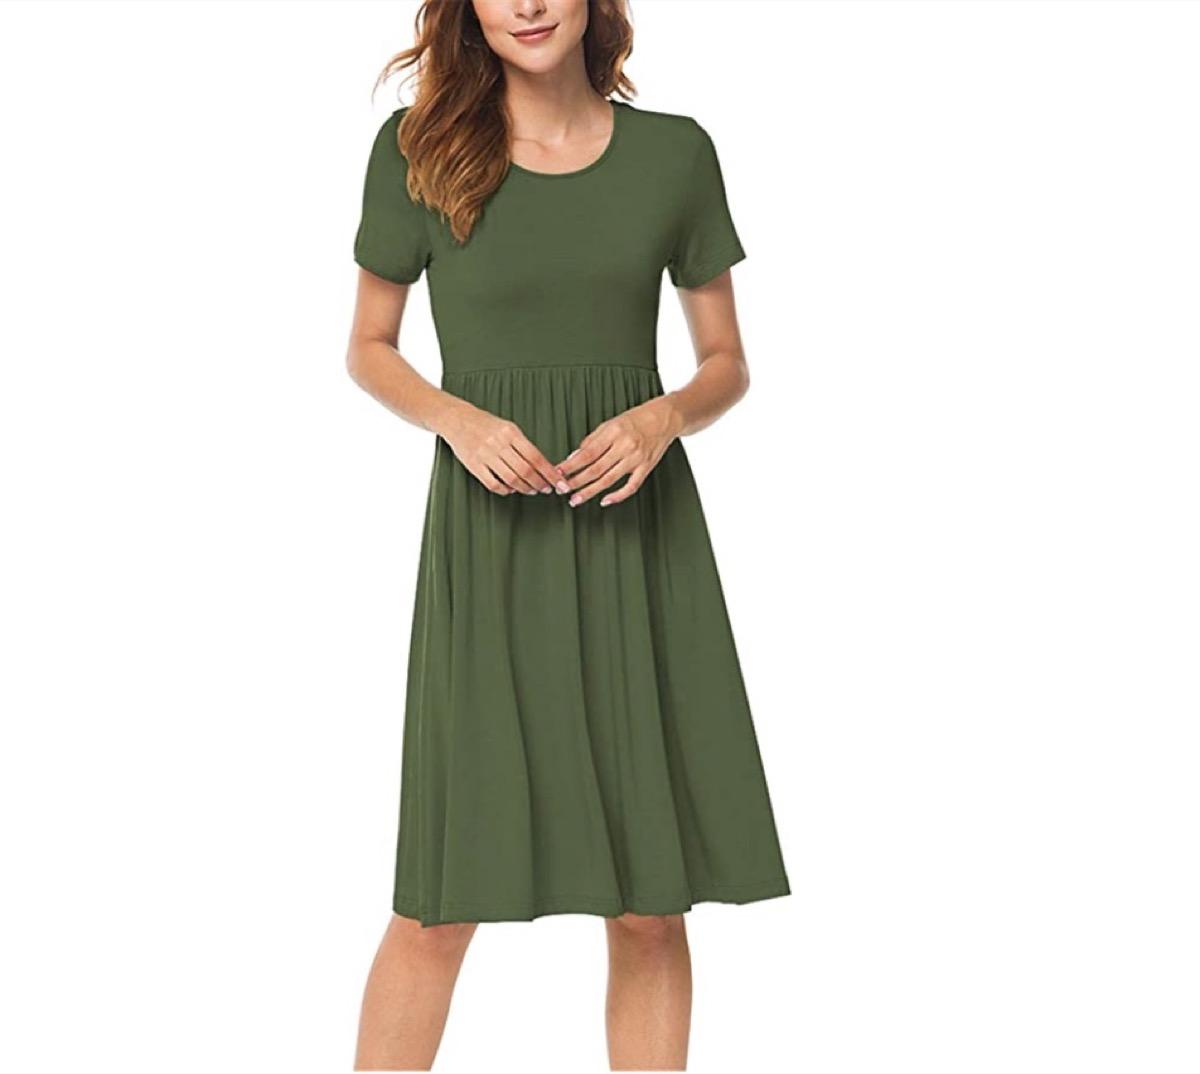 white woman in green dress